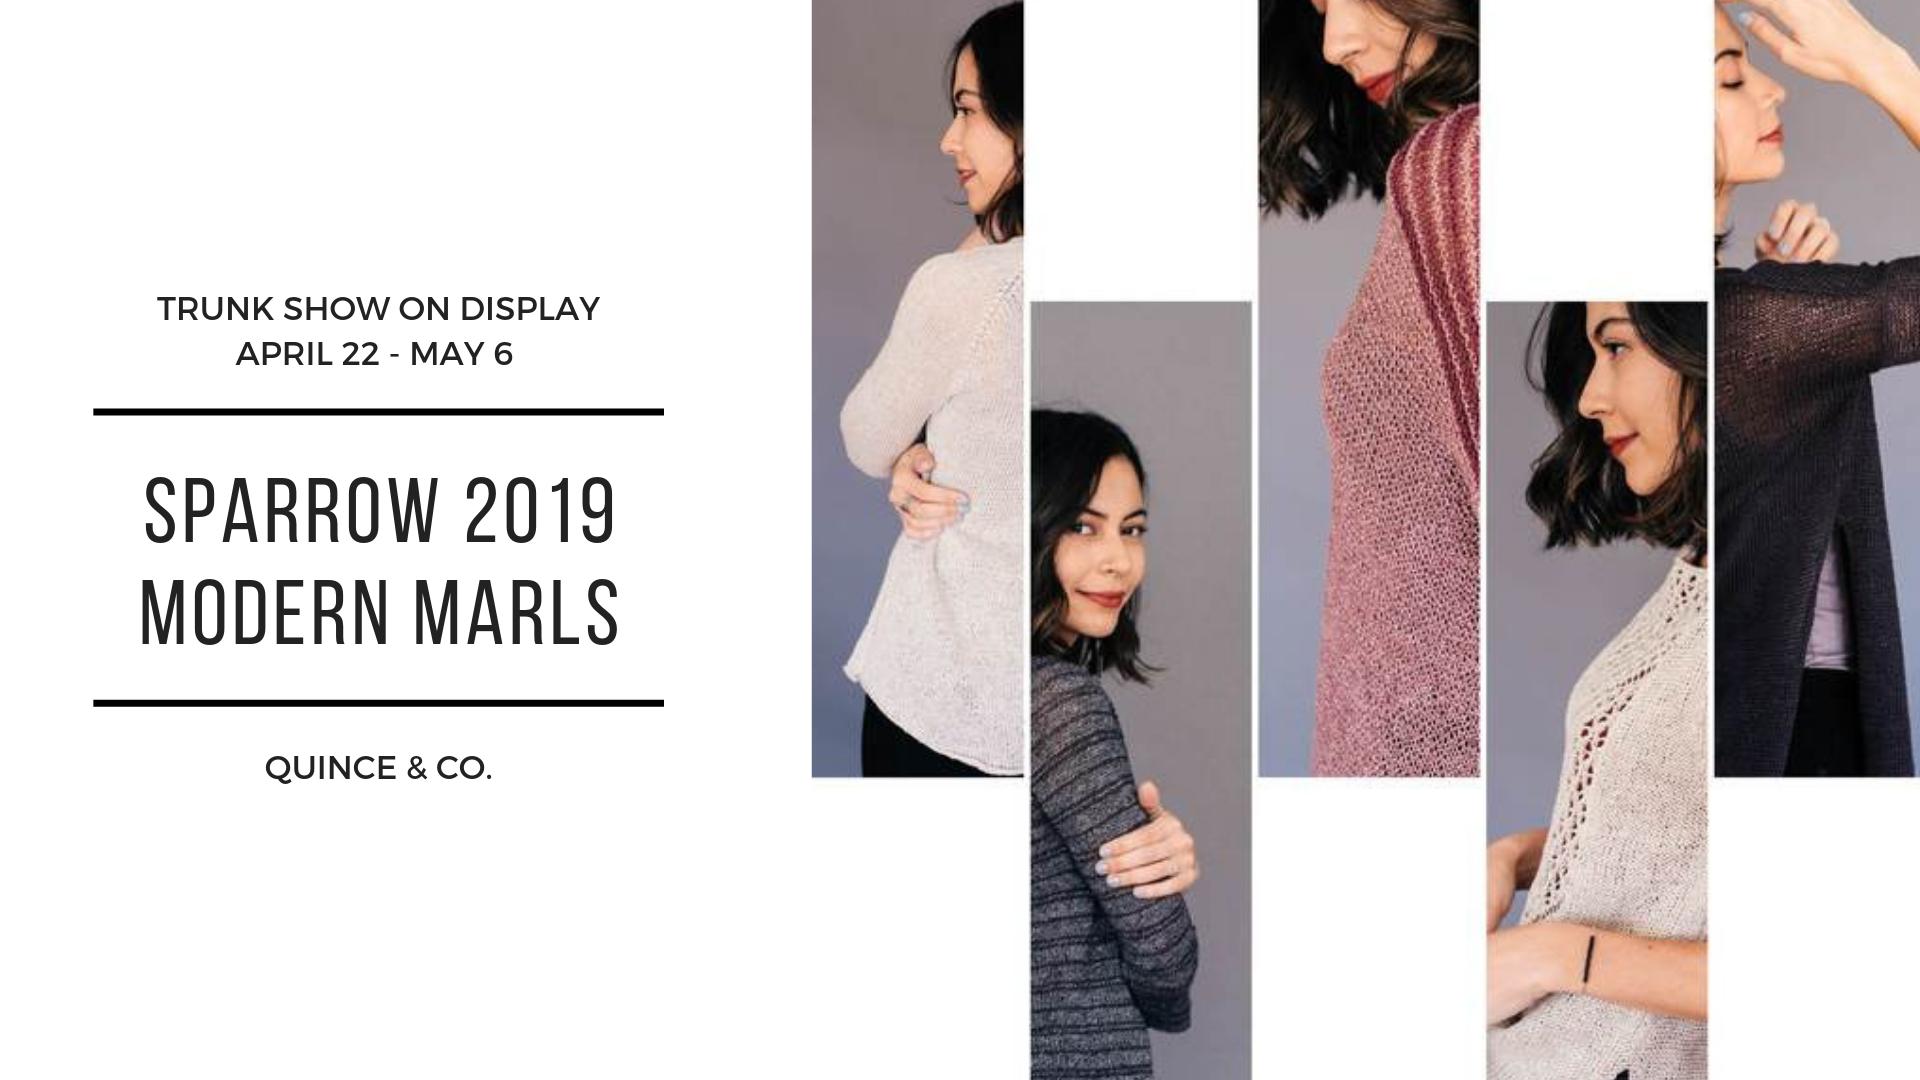 Sparrow 2019 - Modern Marls Trunk Show